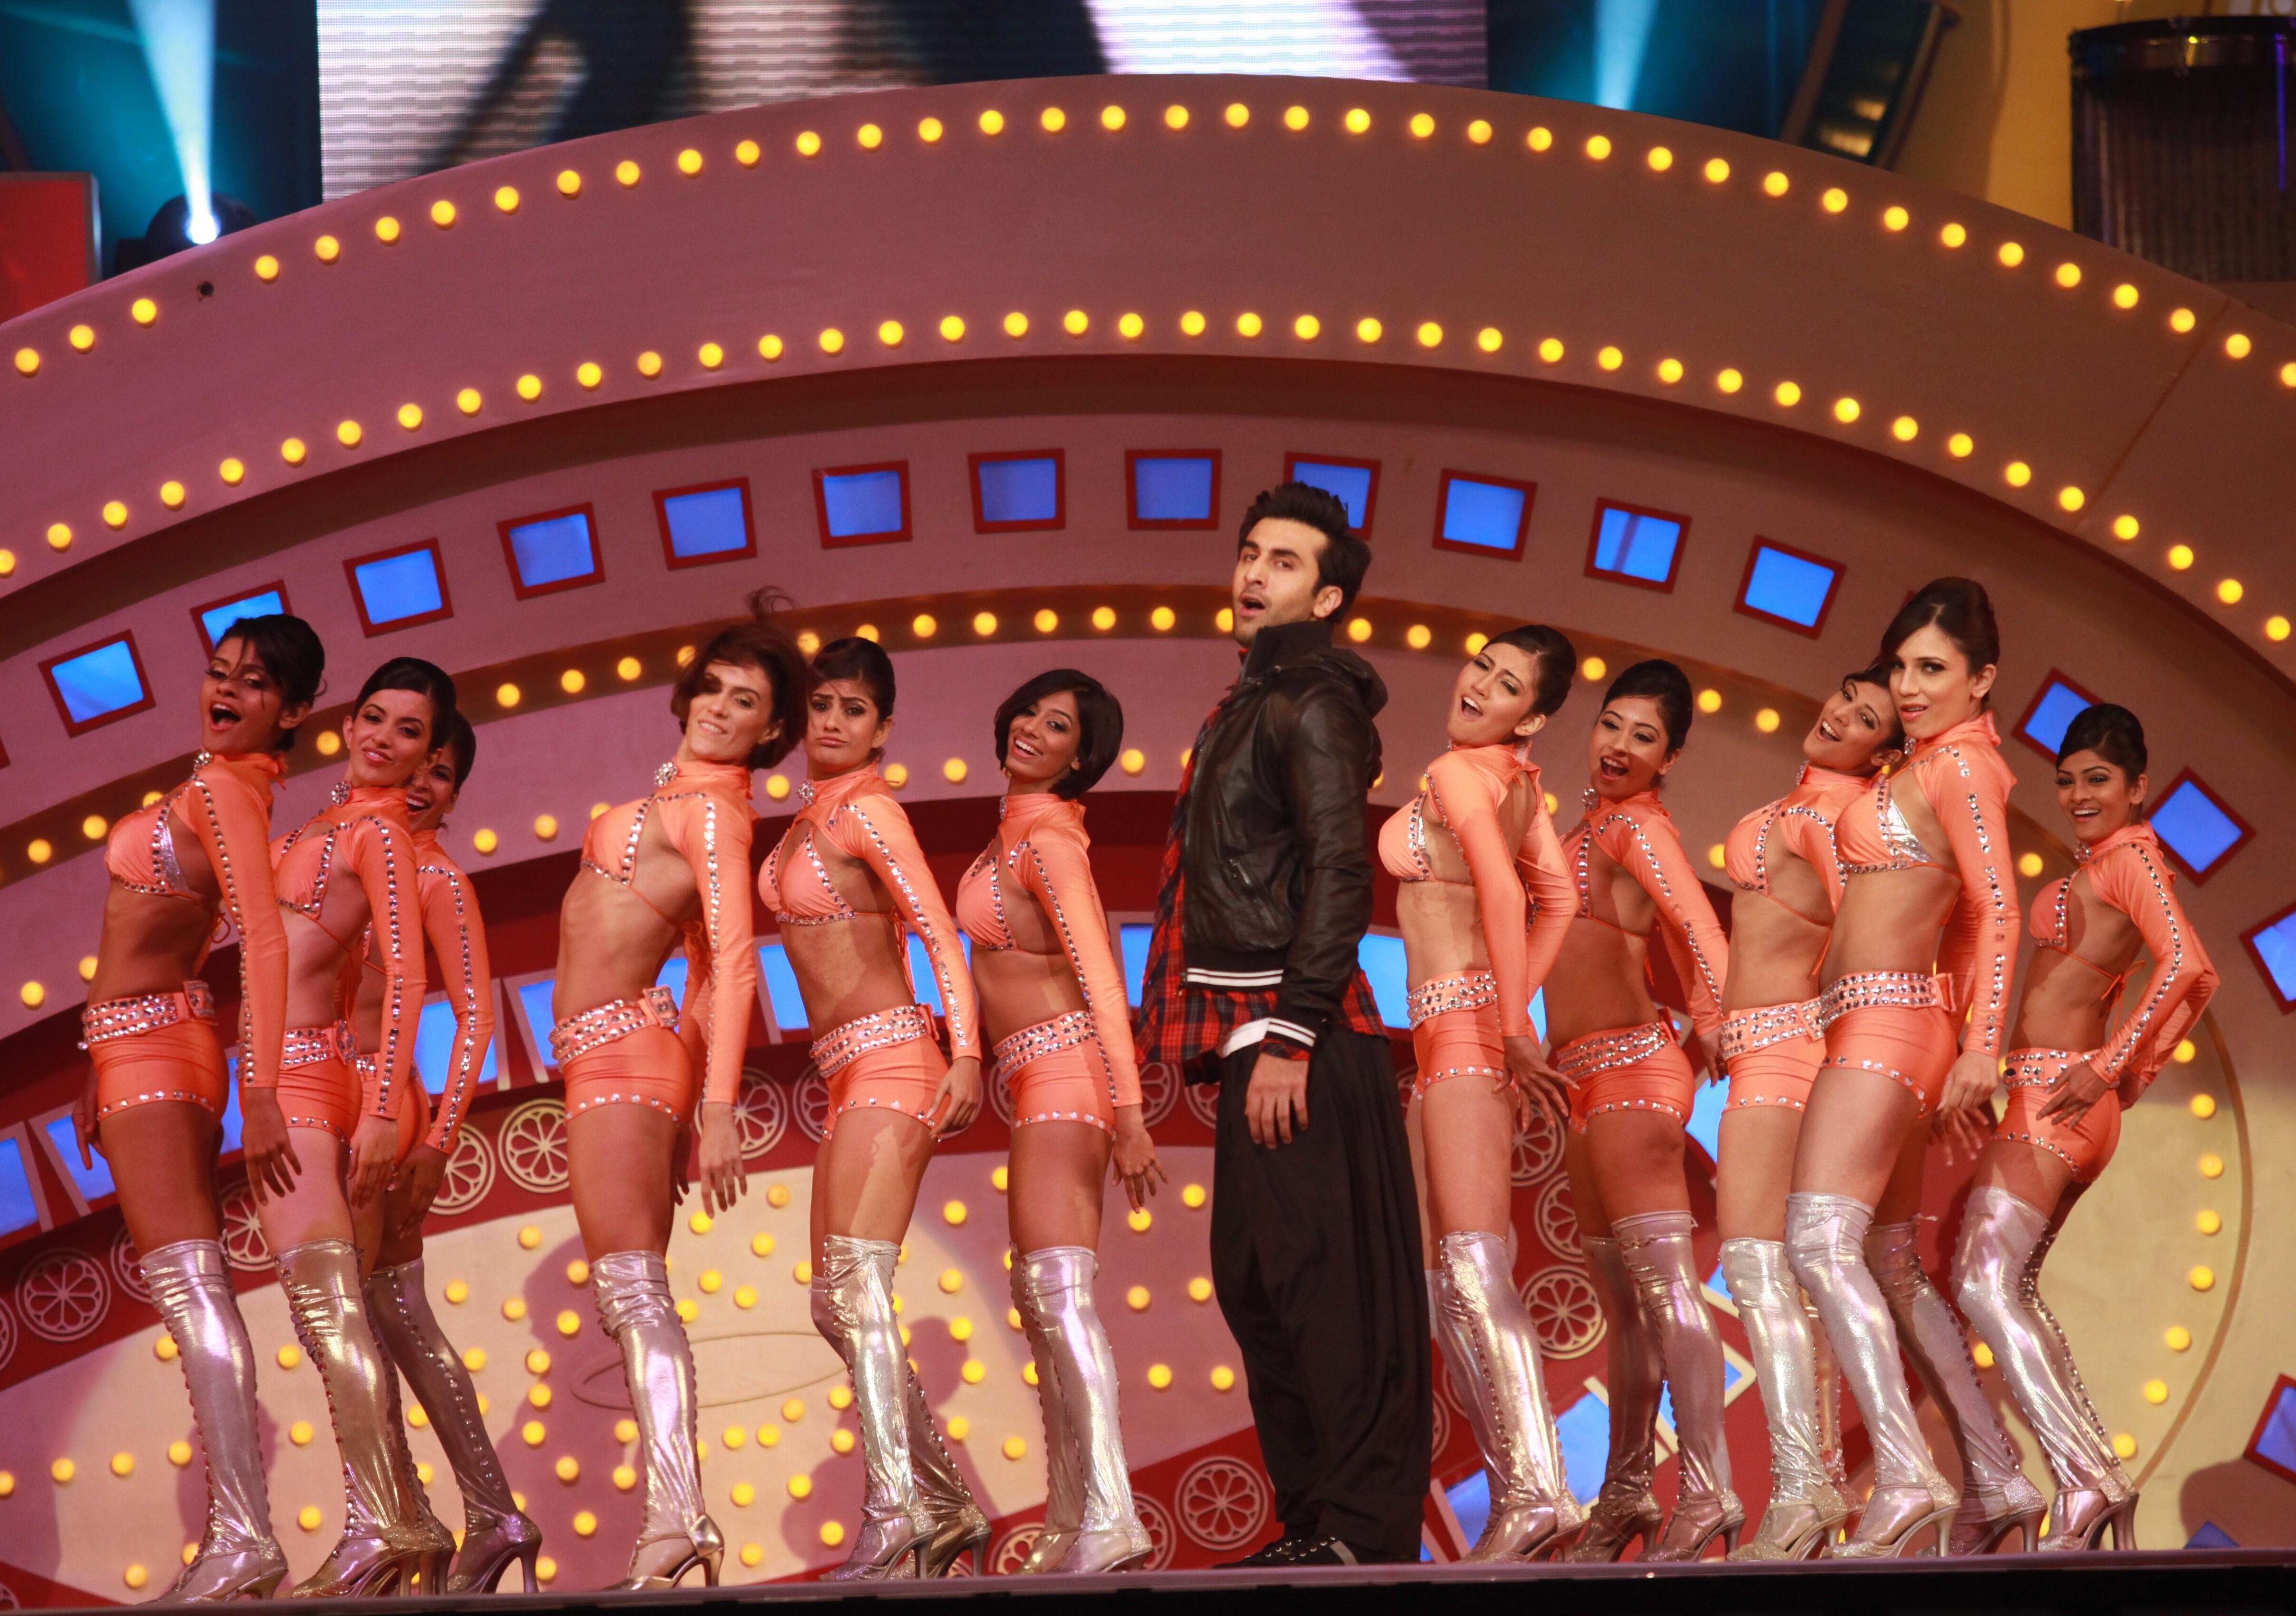 Ranbir Kapoor's hot performance!